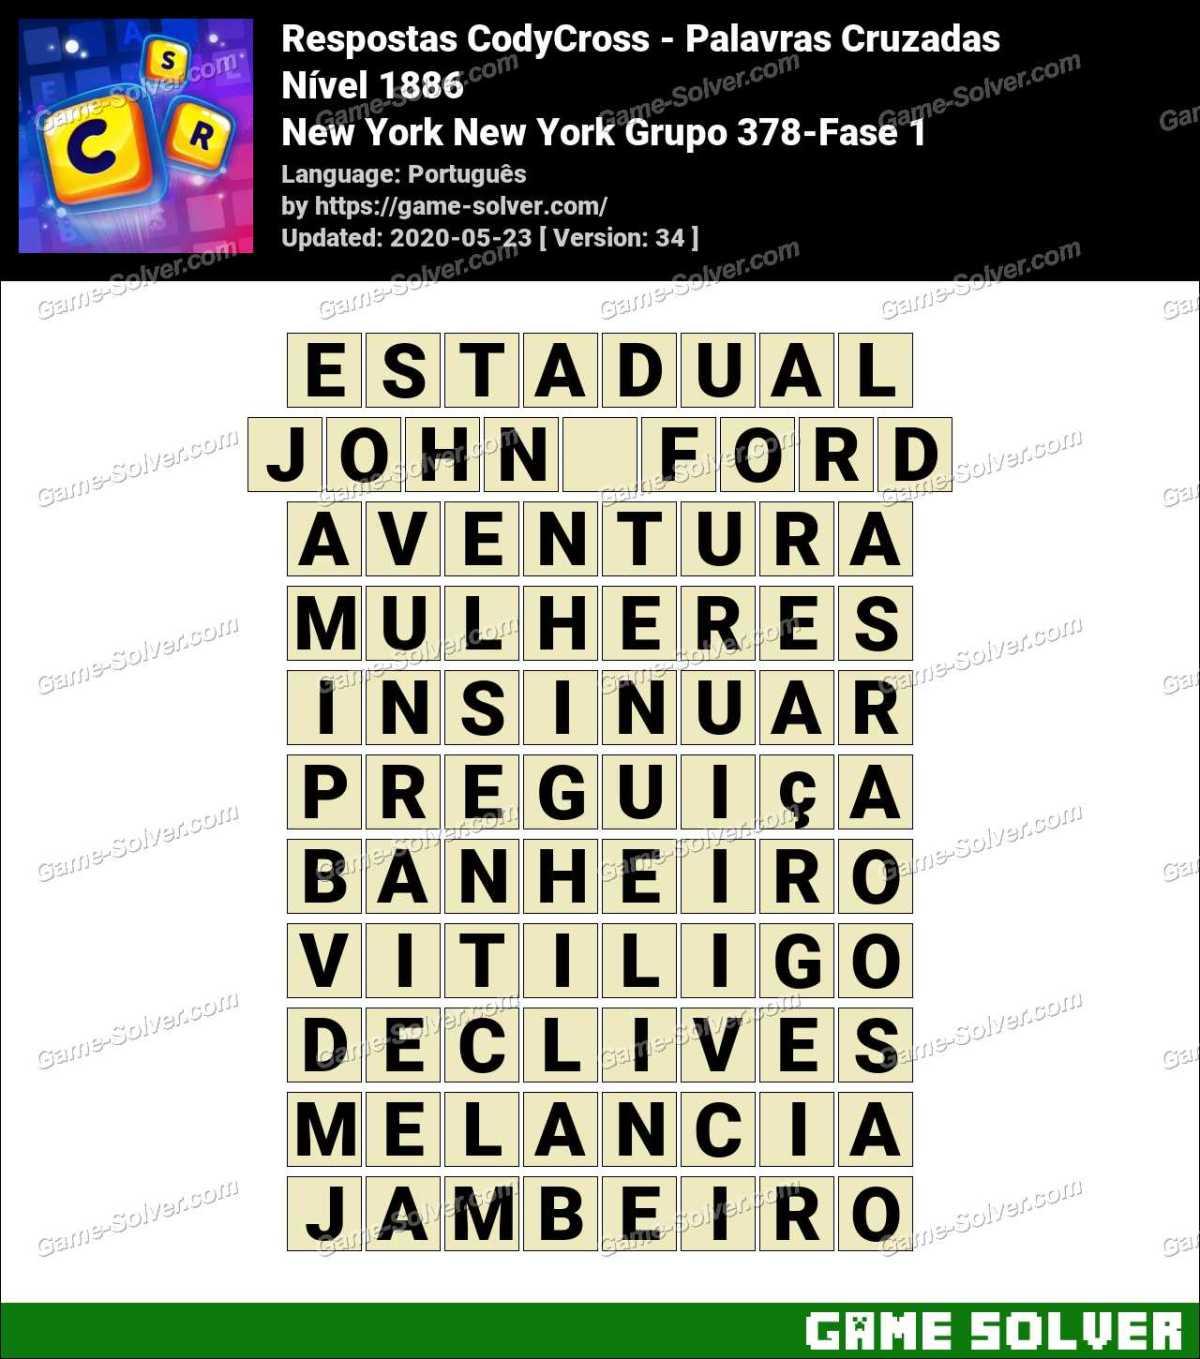 Respostas CodyCross New York New York Grupo 378-Fase 1